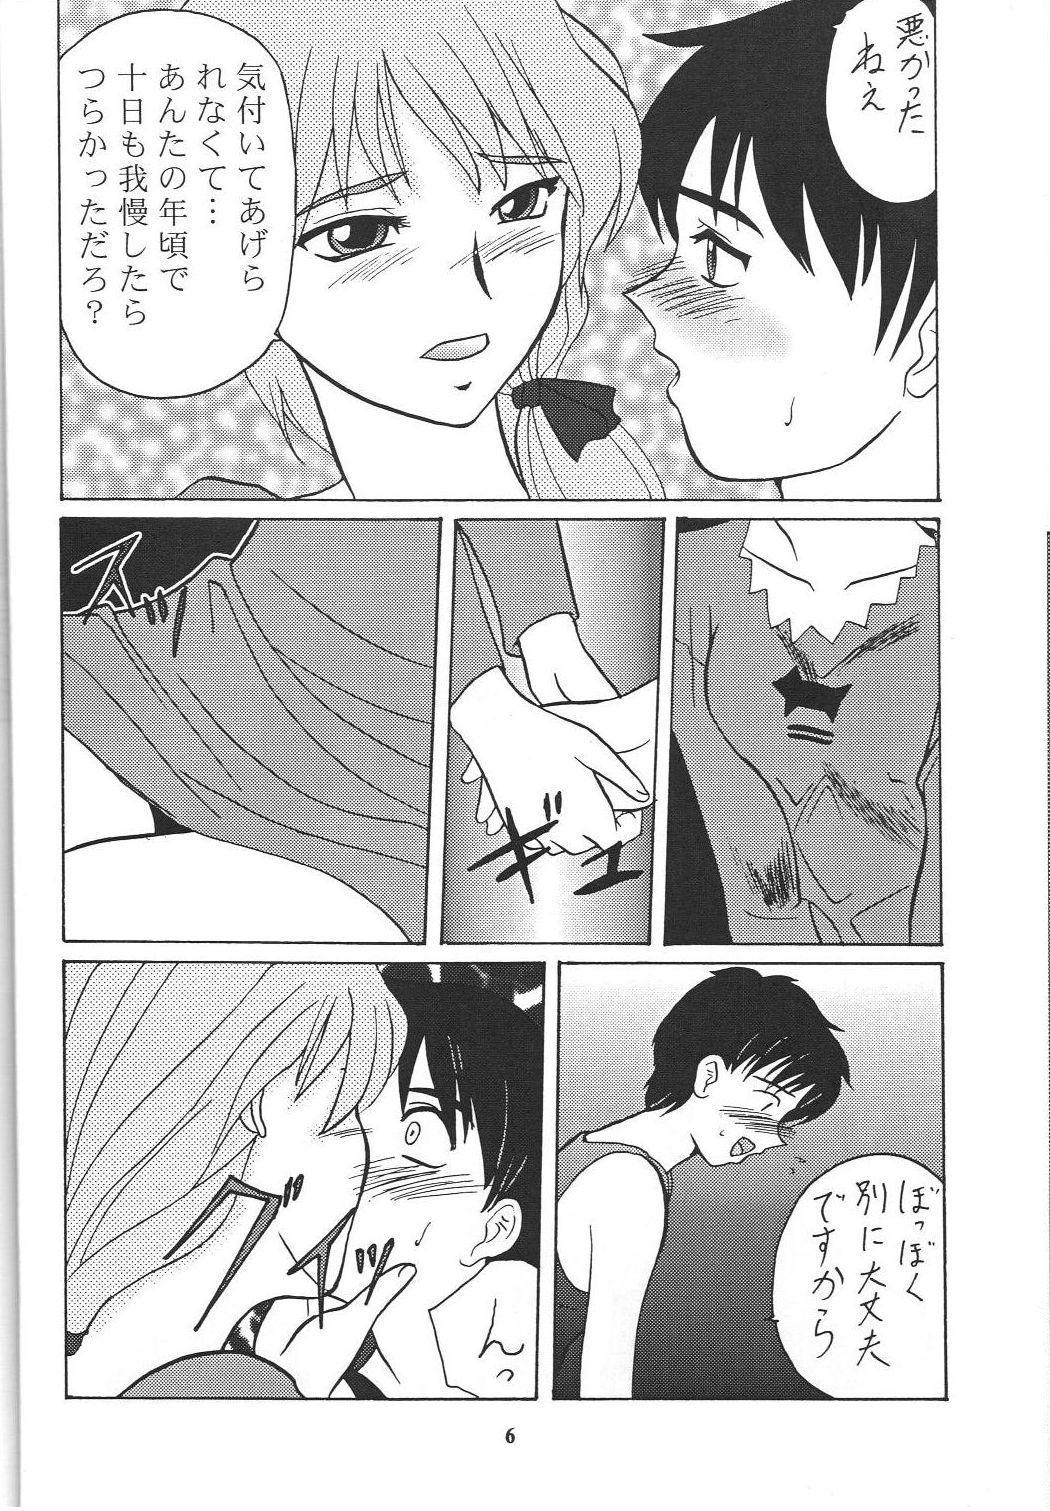 (C56) [Tsurikichi Doumei (Various)] Sengoku Rock - Nan Demo-R (Various) 6